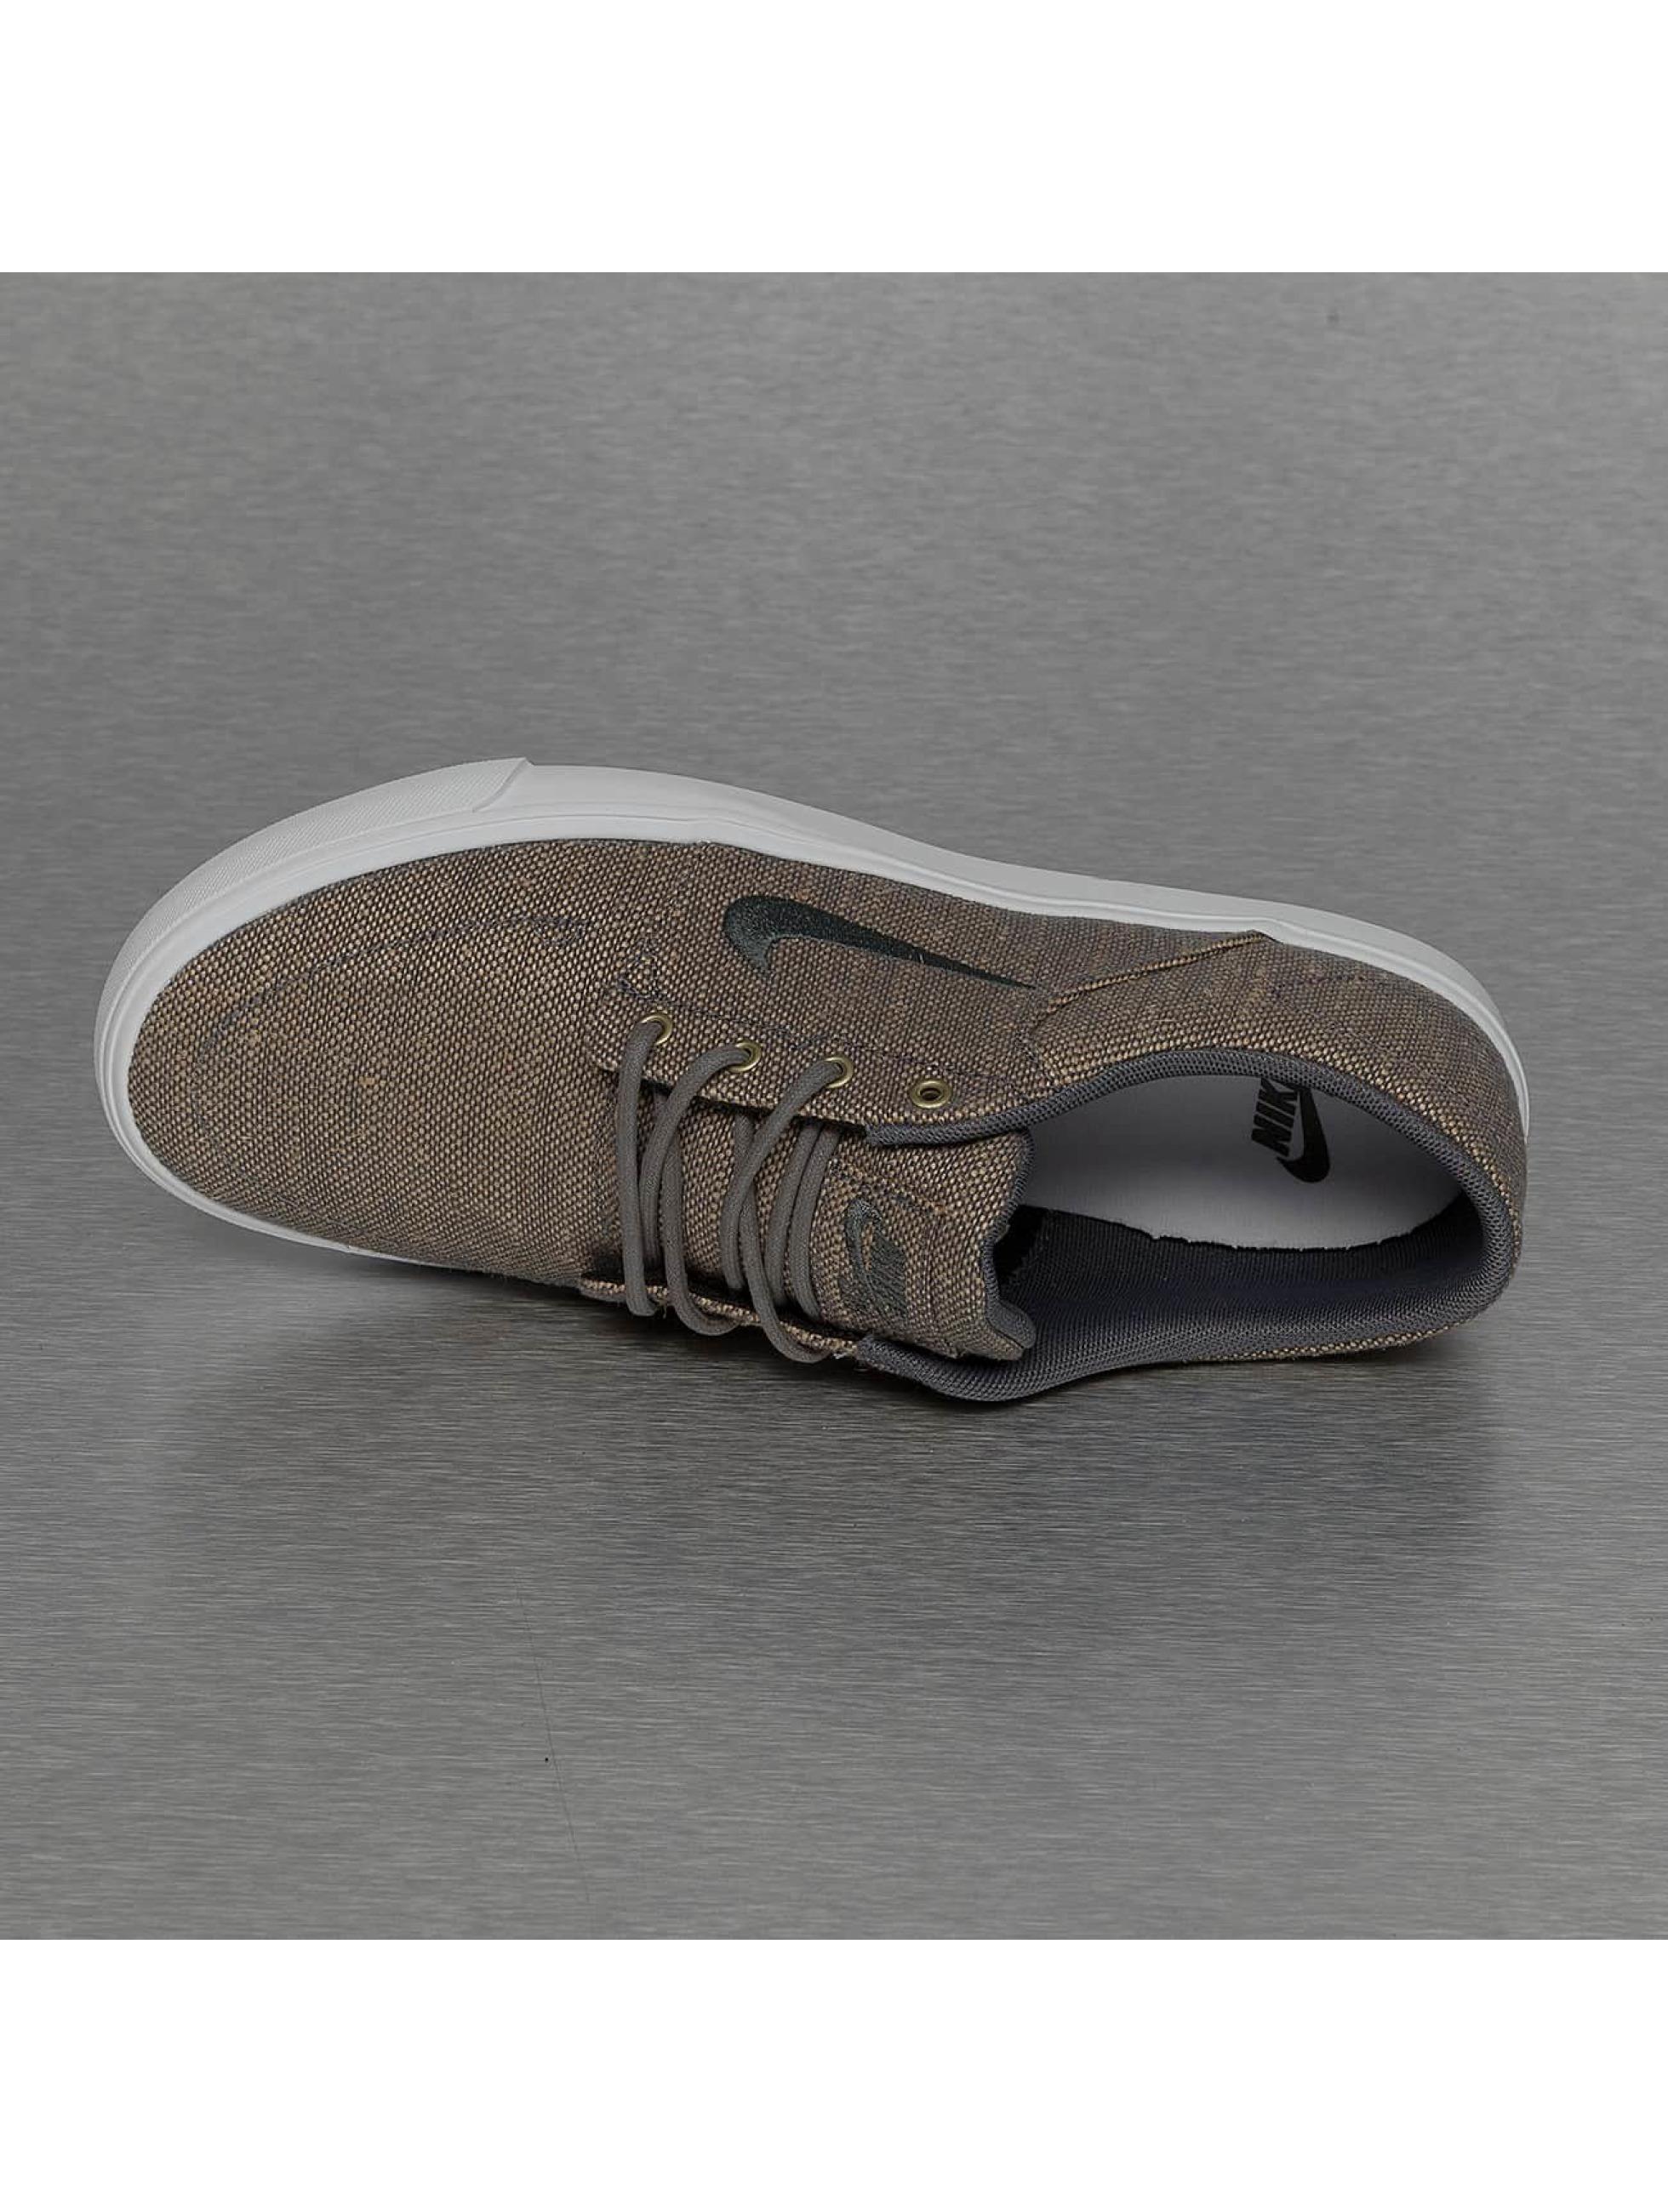 nike air max verser fille - Nike SB Chaussures / Baskets SB Portmore Canvas Premium en gris 258042